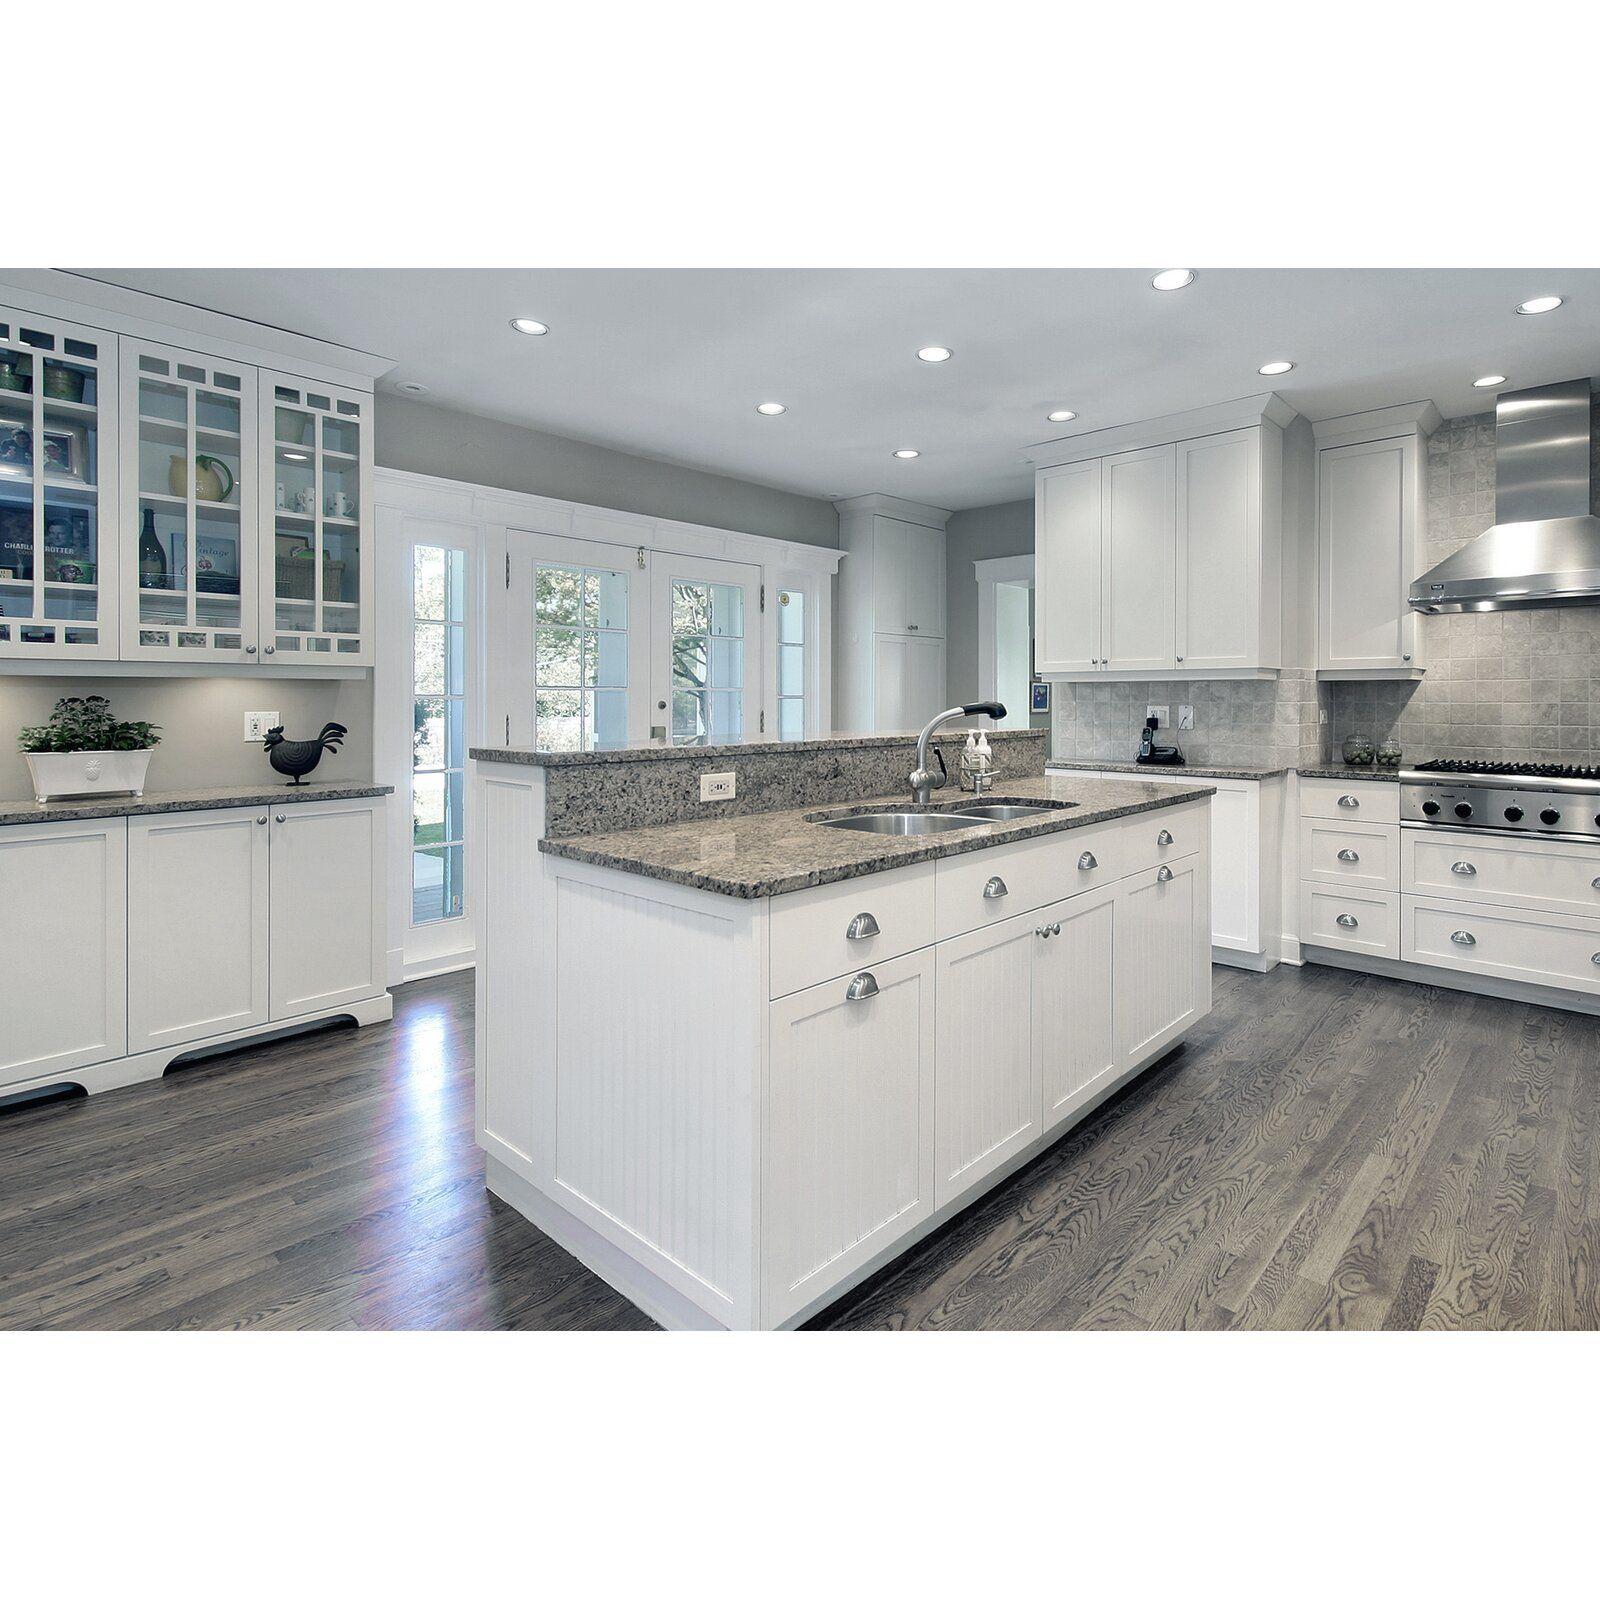 5 Led Recessed Lighting Kit Kitchen Remodel Small Modern Kitchen Cabinet Design Kitchen Remodel Layout